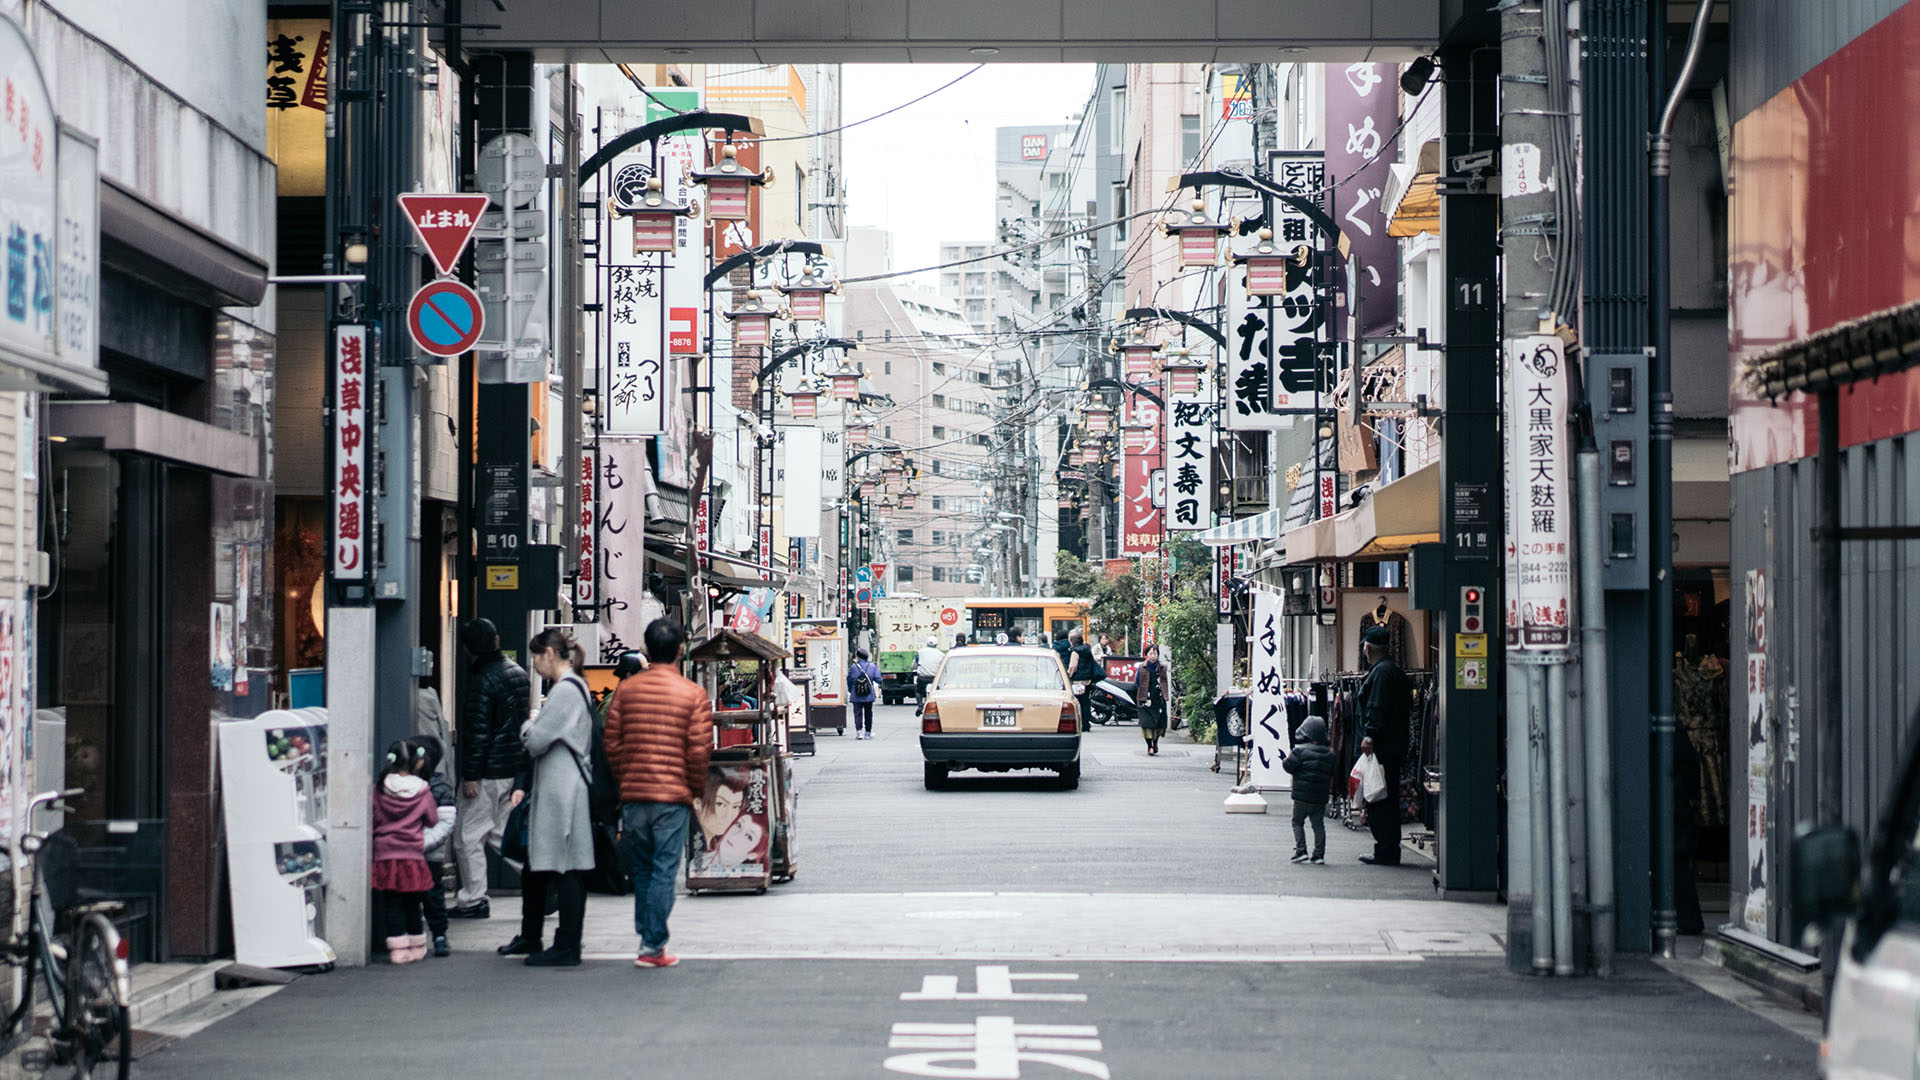 JapanPhotog-Work_TemplateArtboard 5.jpg